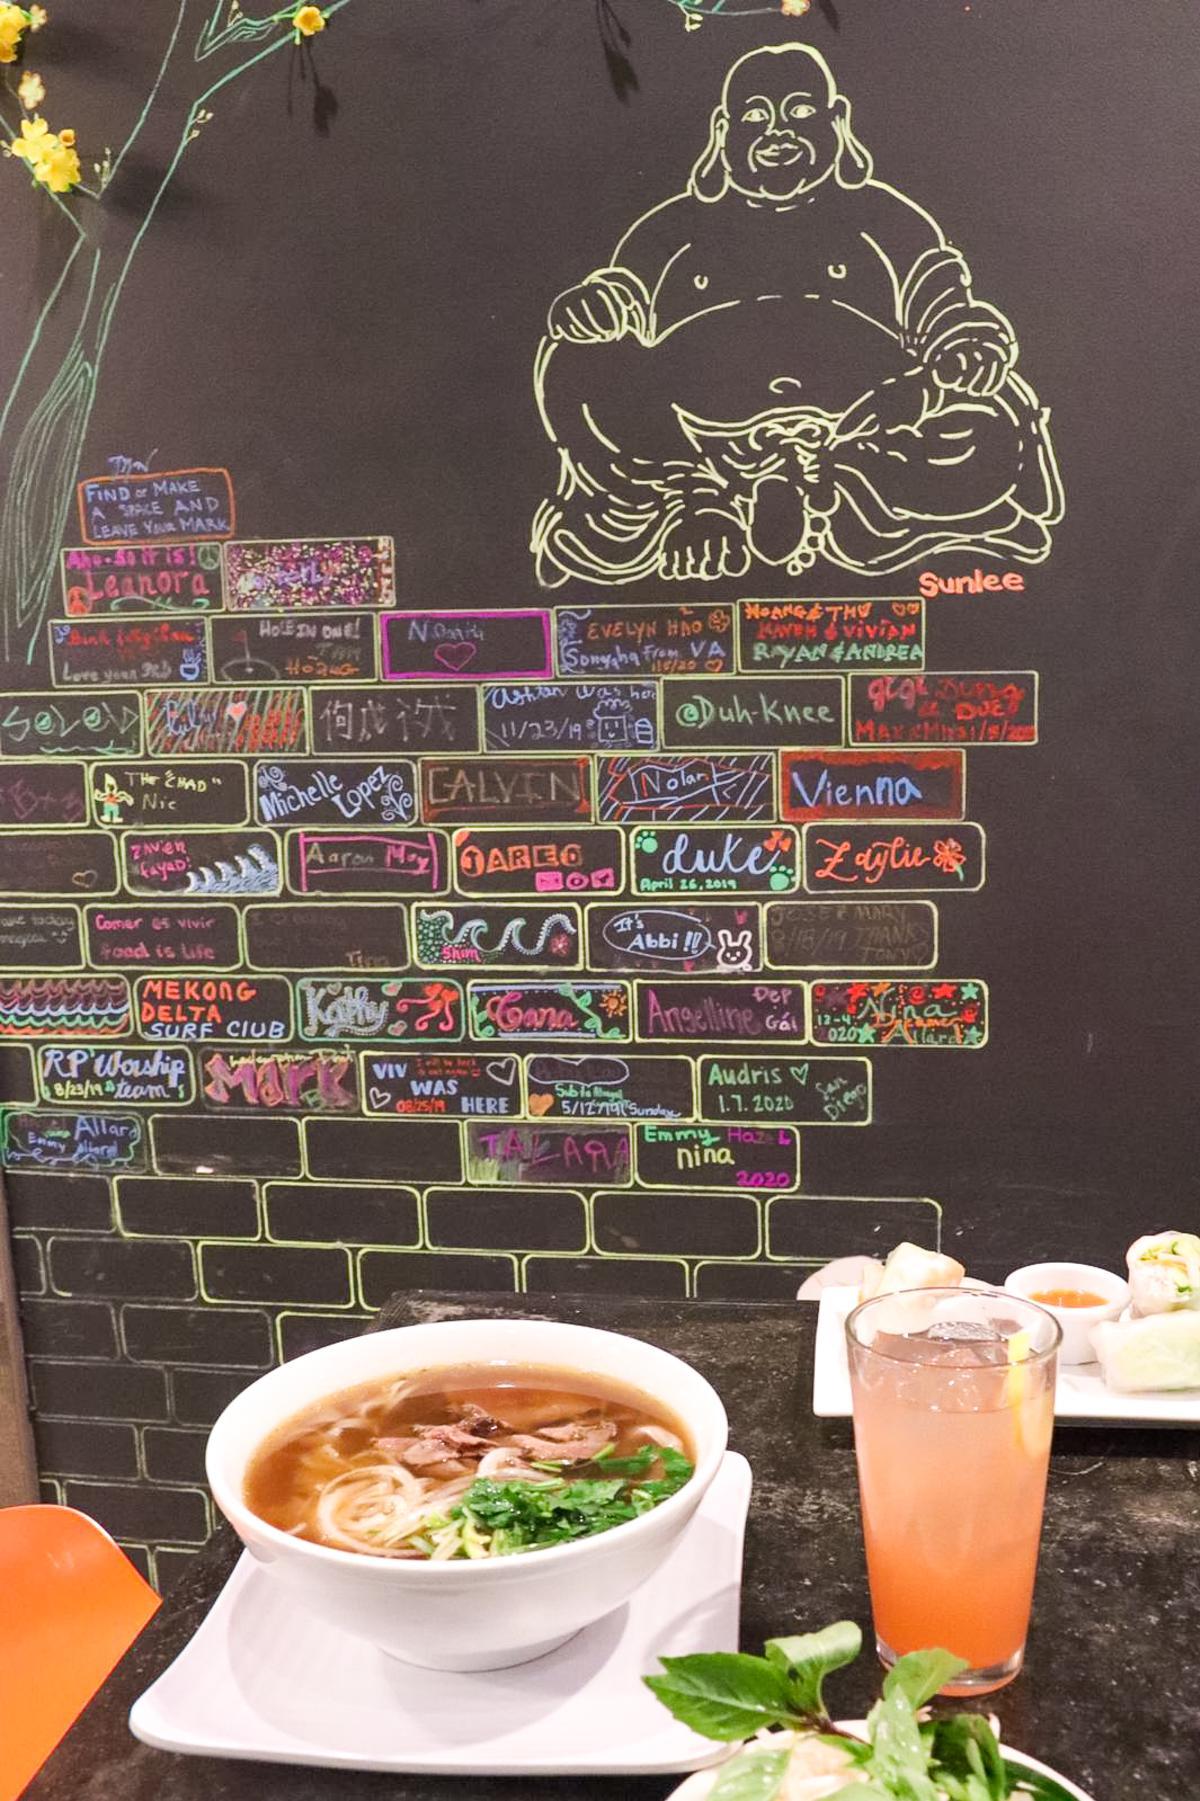 Silk Noodle in Huntington Beach